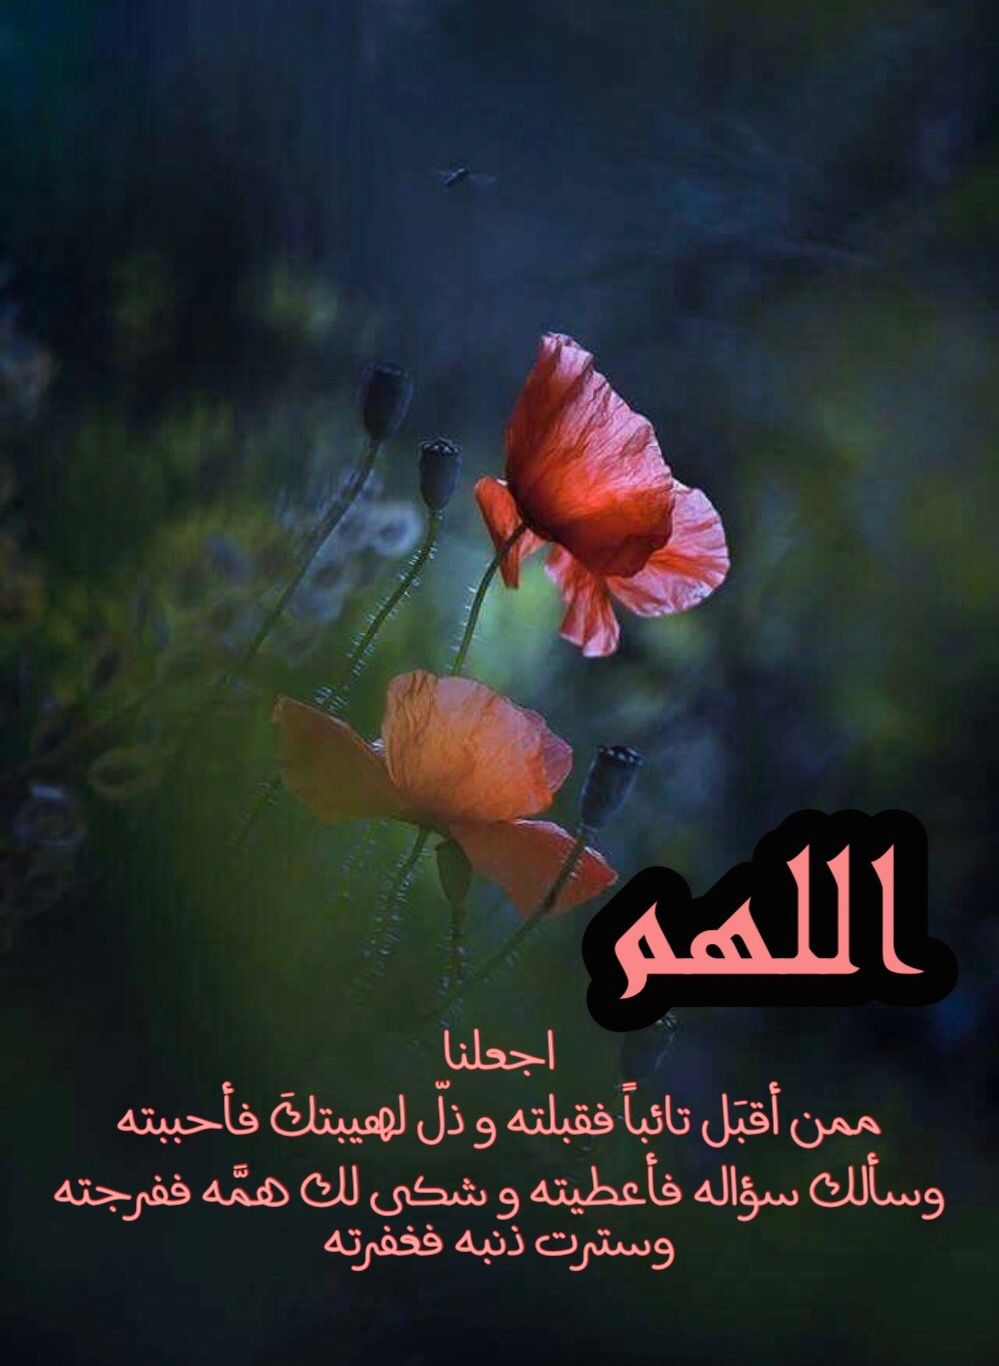 Pin By Bilssan Rim On دعاء Arabic Jokes Arabic Quotes Islam Hadith